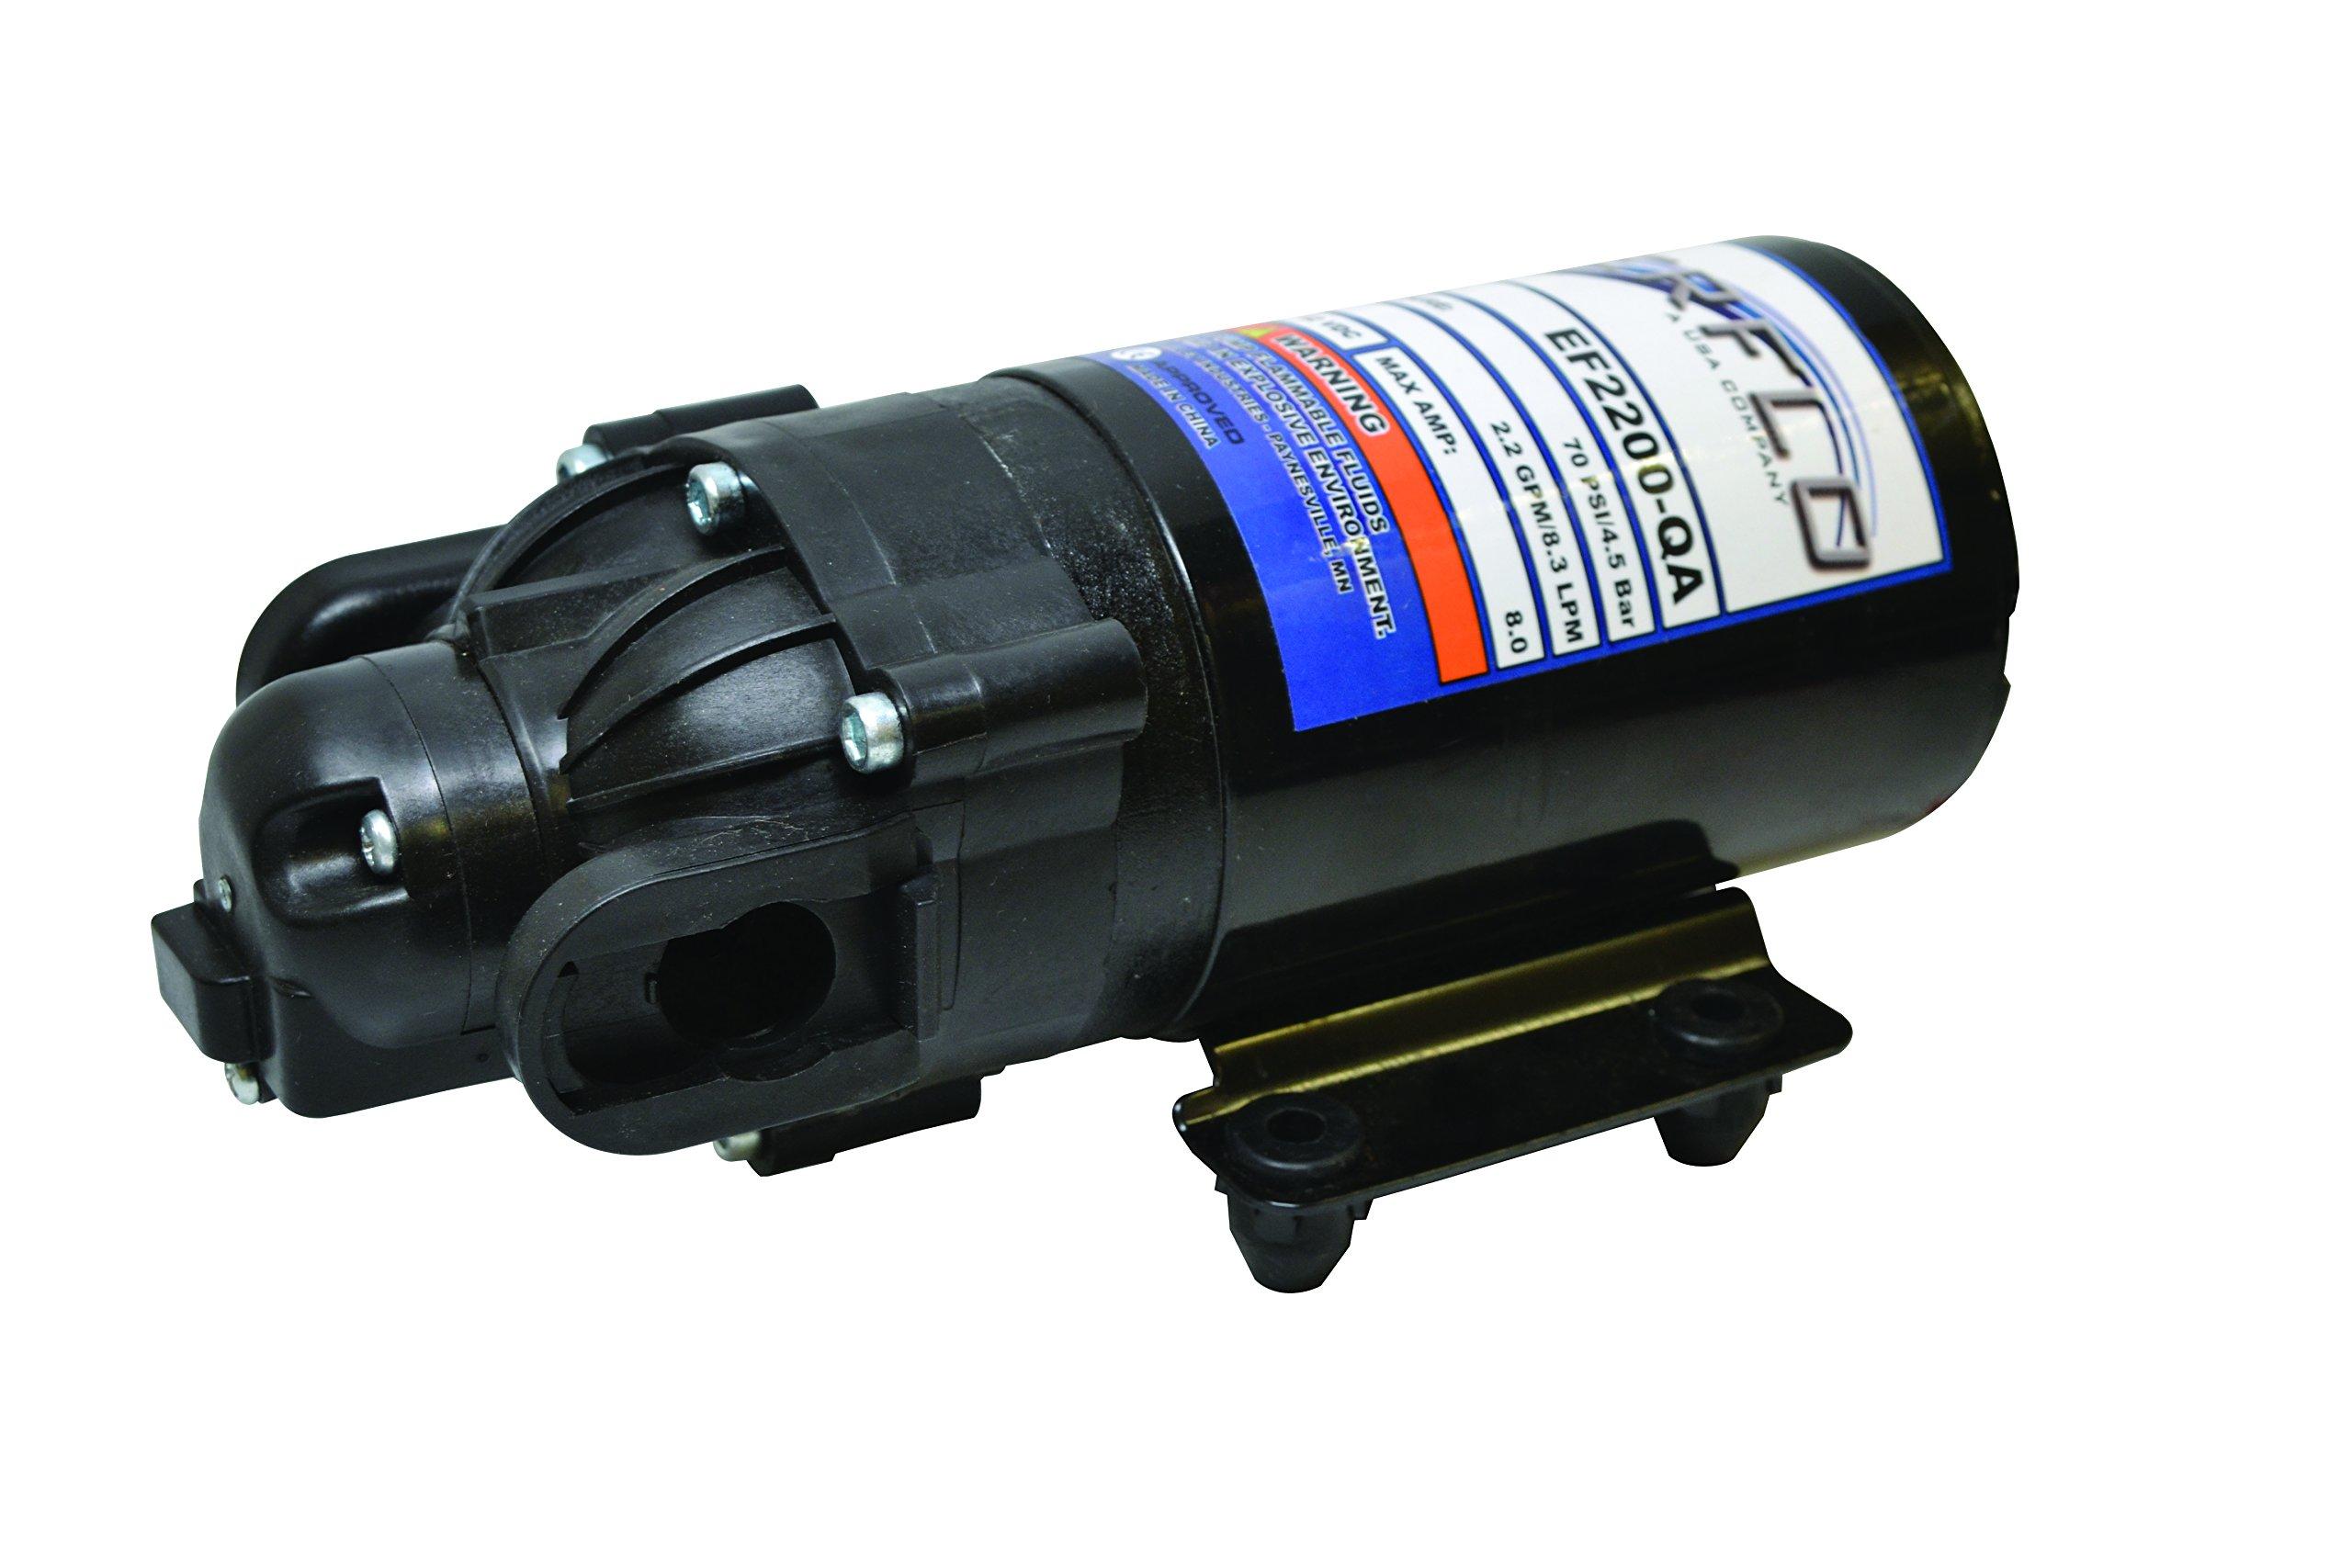 Everflo EF2200-QA-BOX 2.2GPM 12V Diaphragm Pump-Quick Attach Port, Black